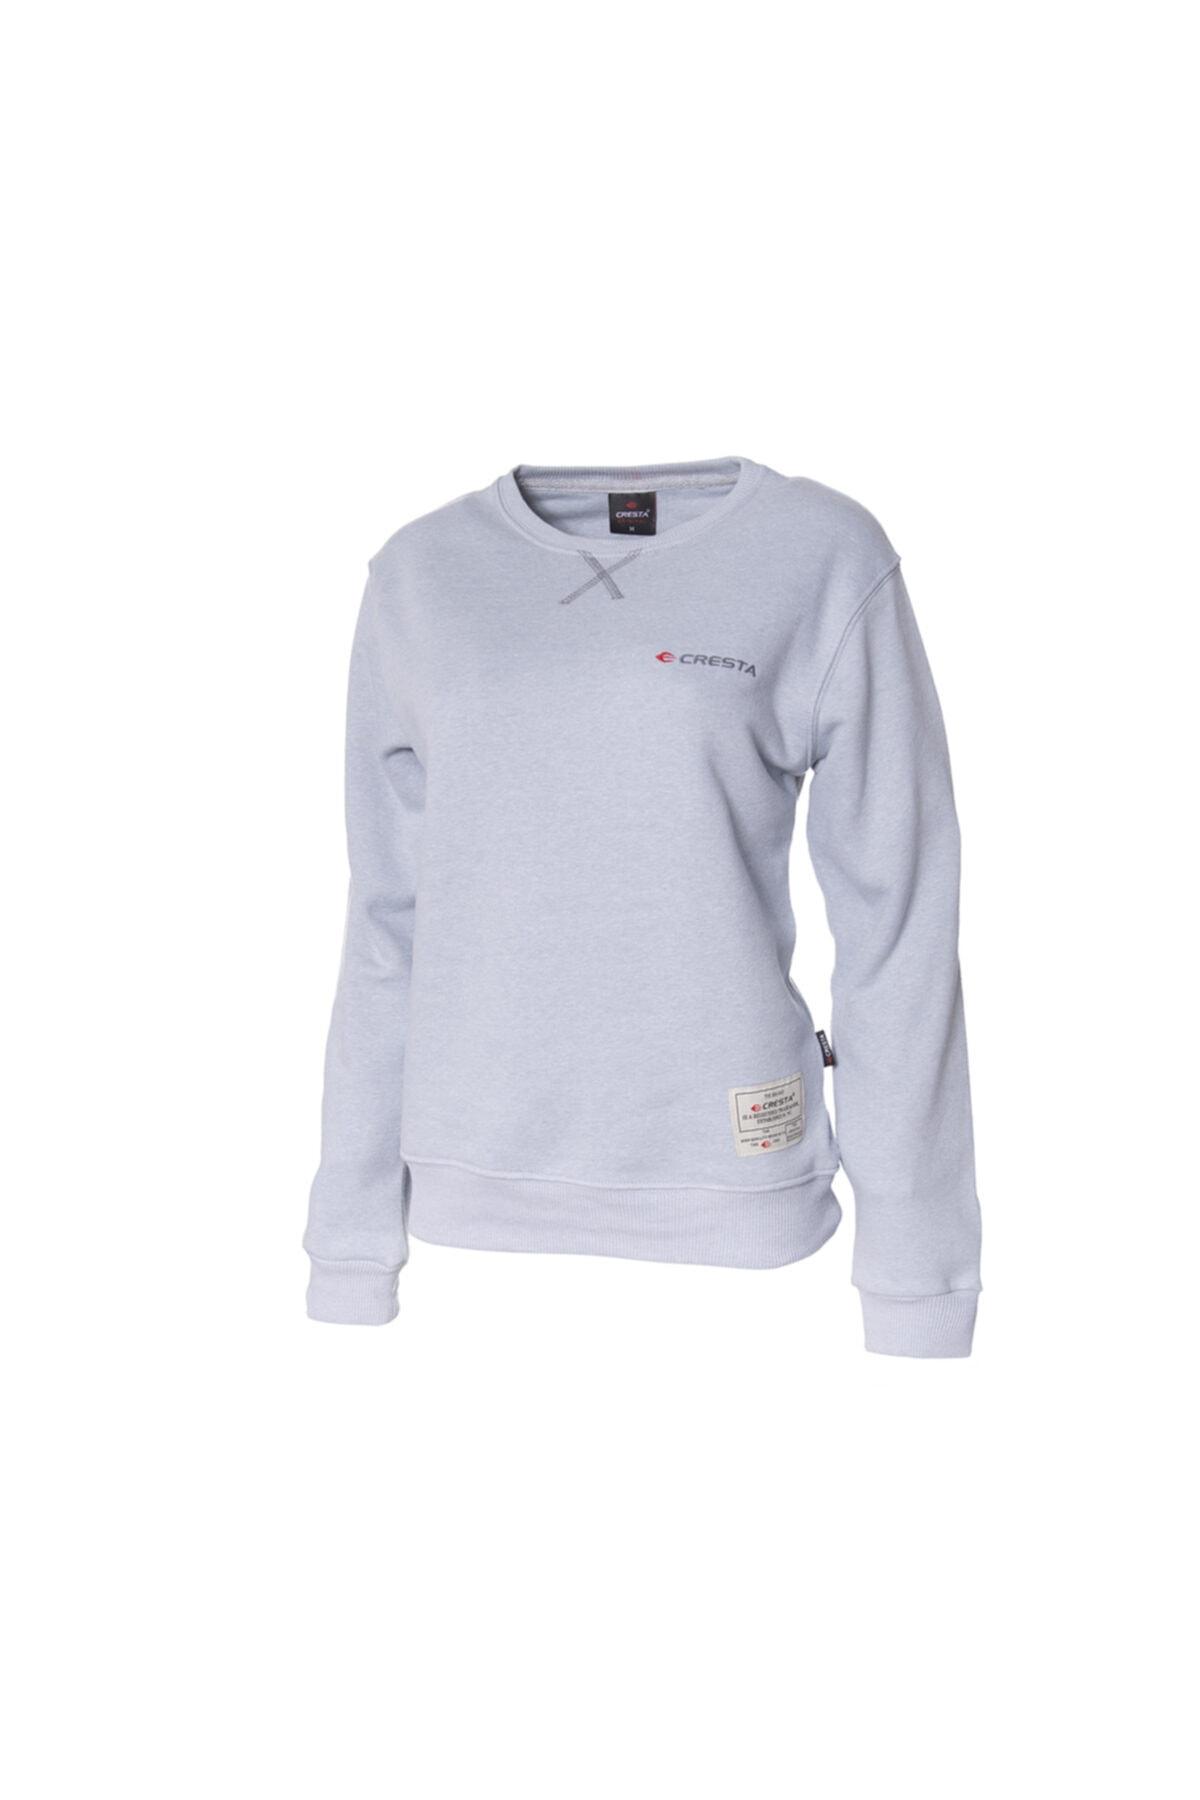 Cresta Kadın Gri Basic Outdoor Sweatshirt 1